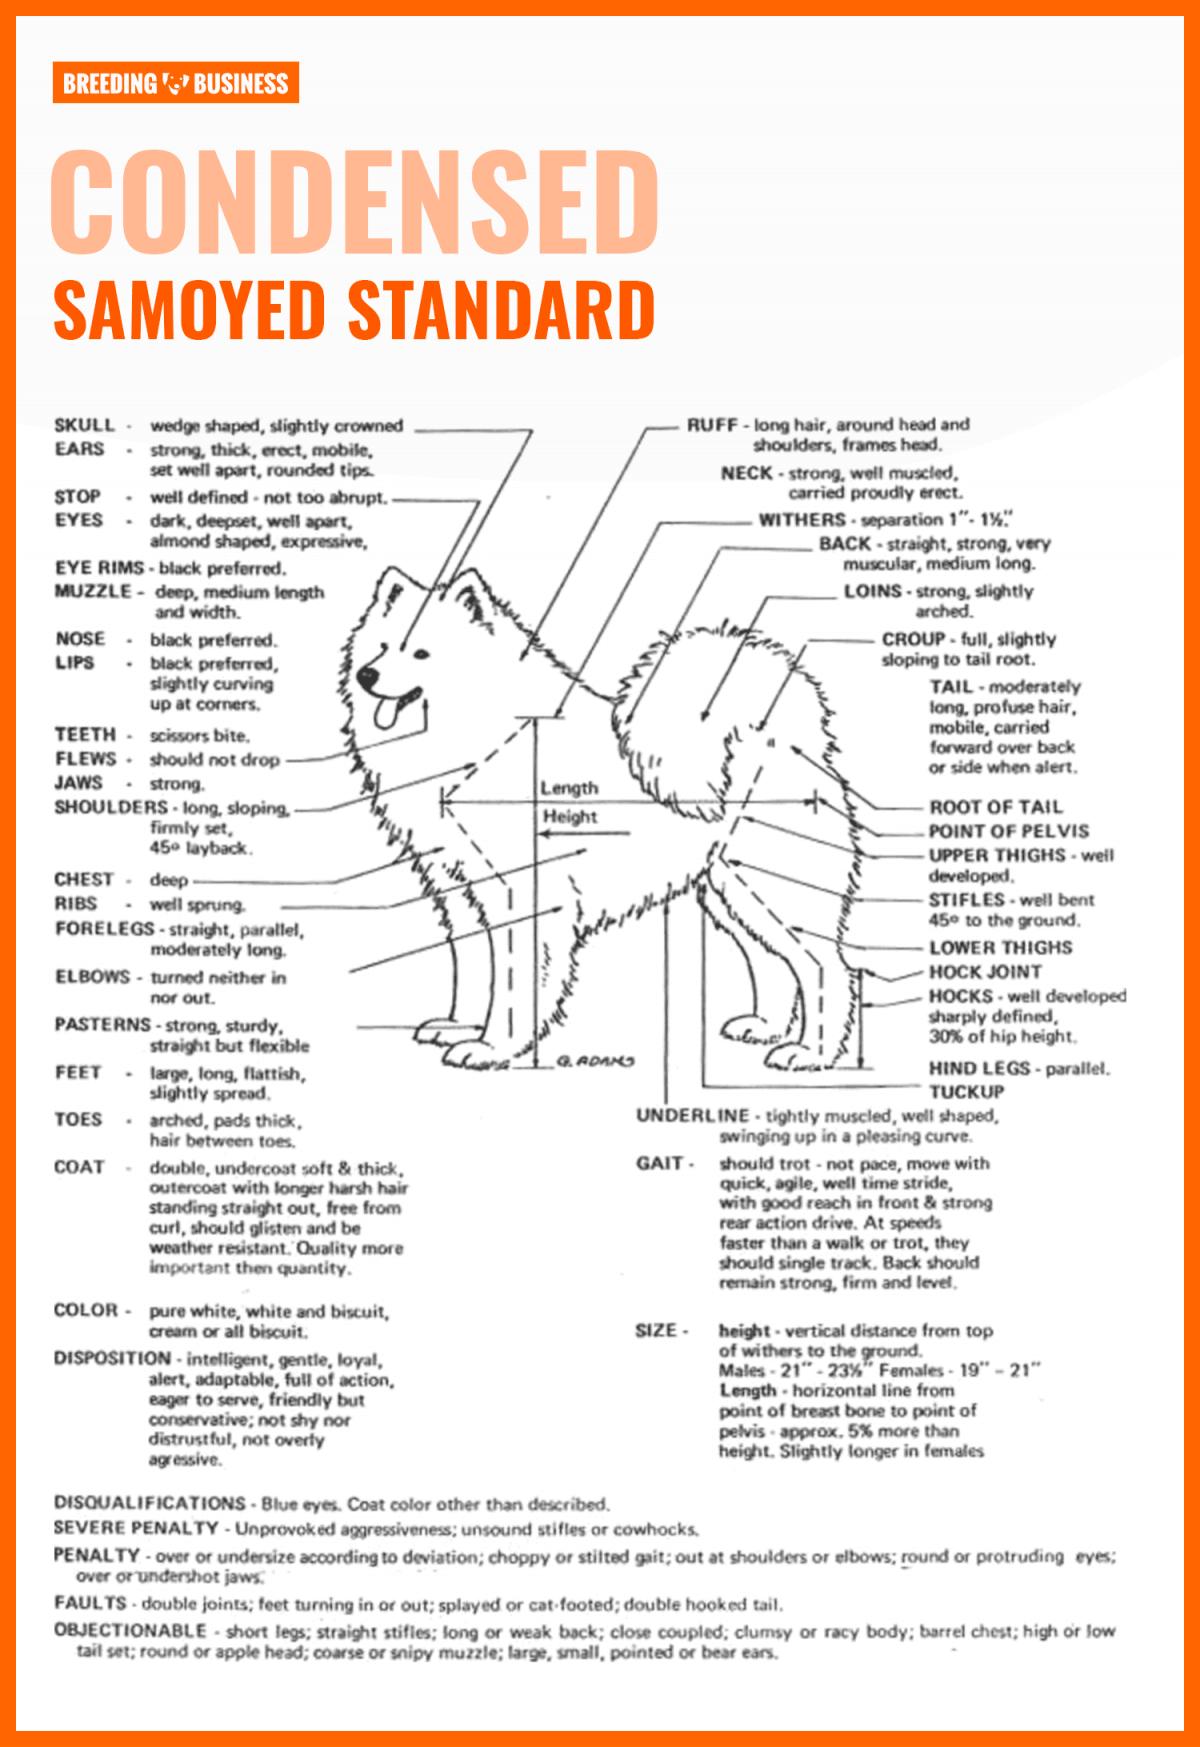 Samoyed standard chart